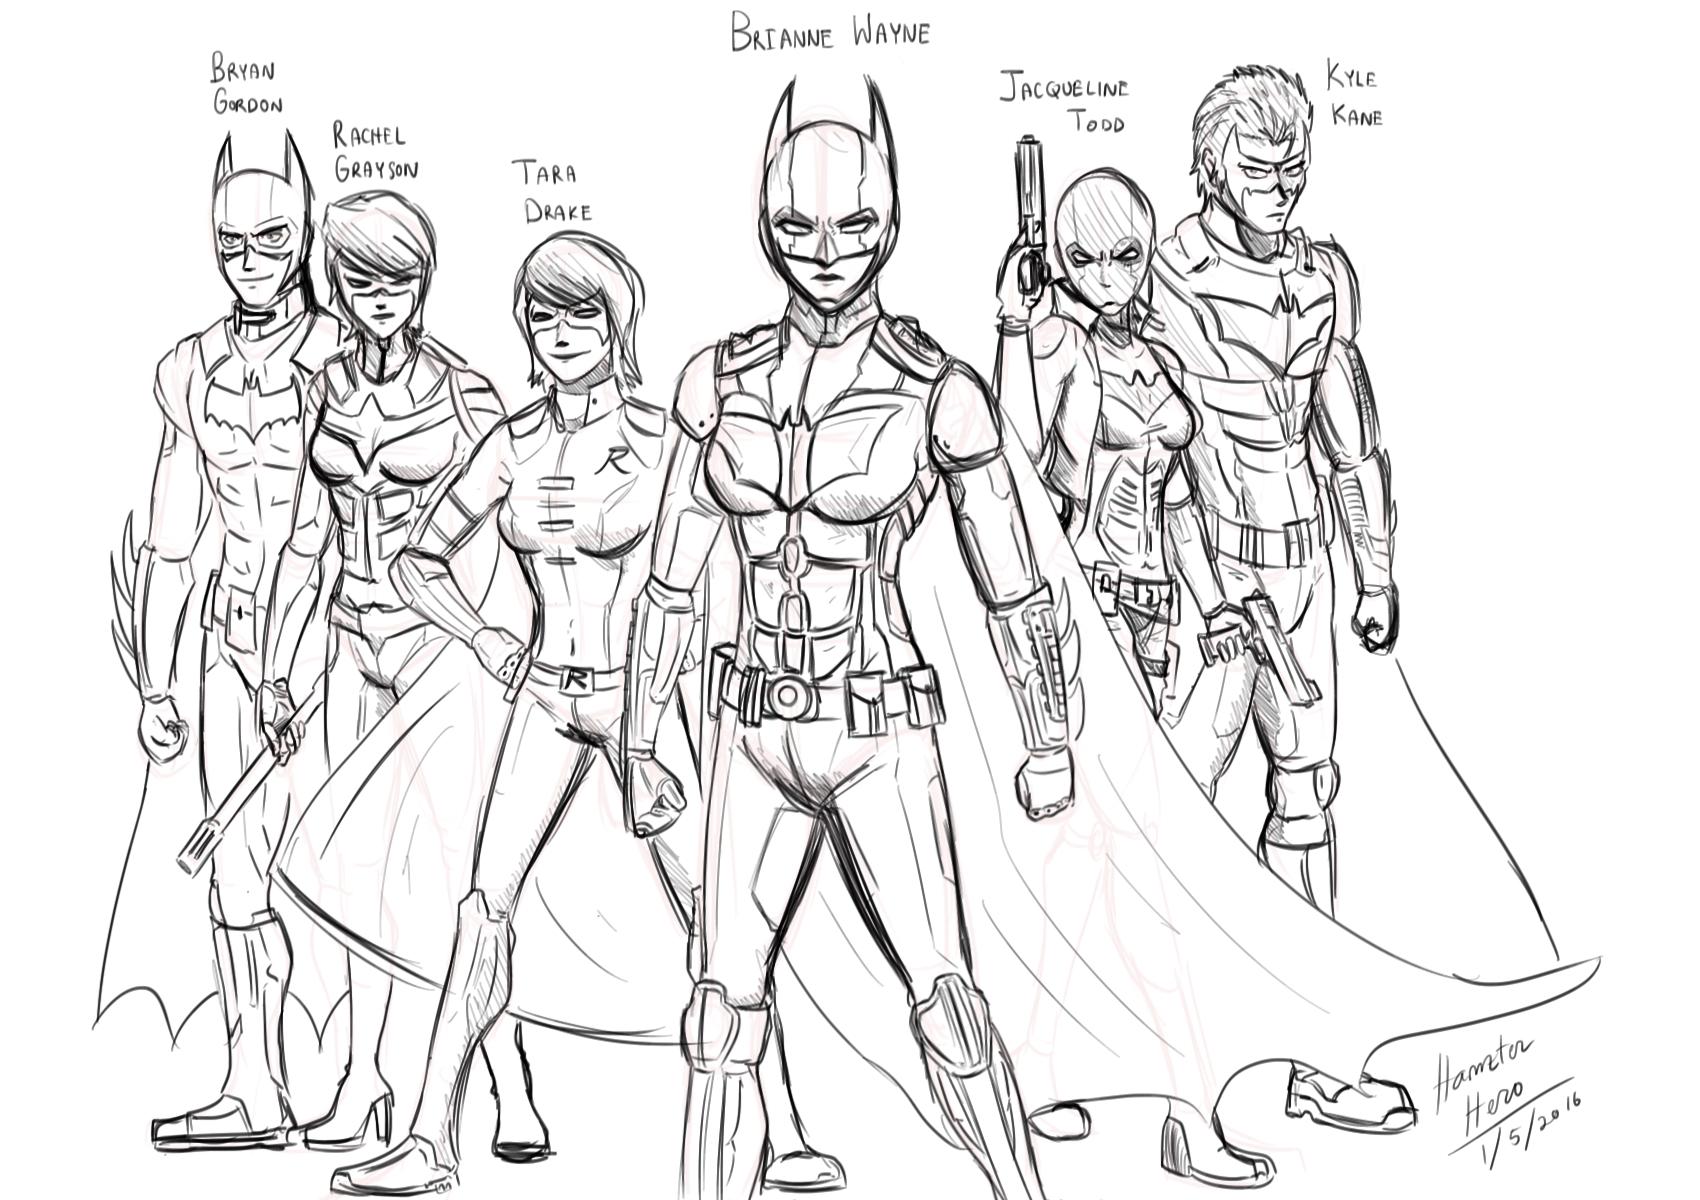 Genderswap Batfamily sketch by HamzterHero on DeviantArt